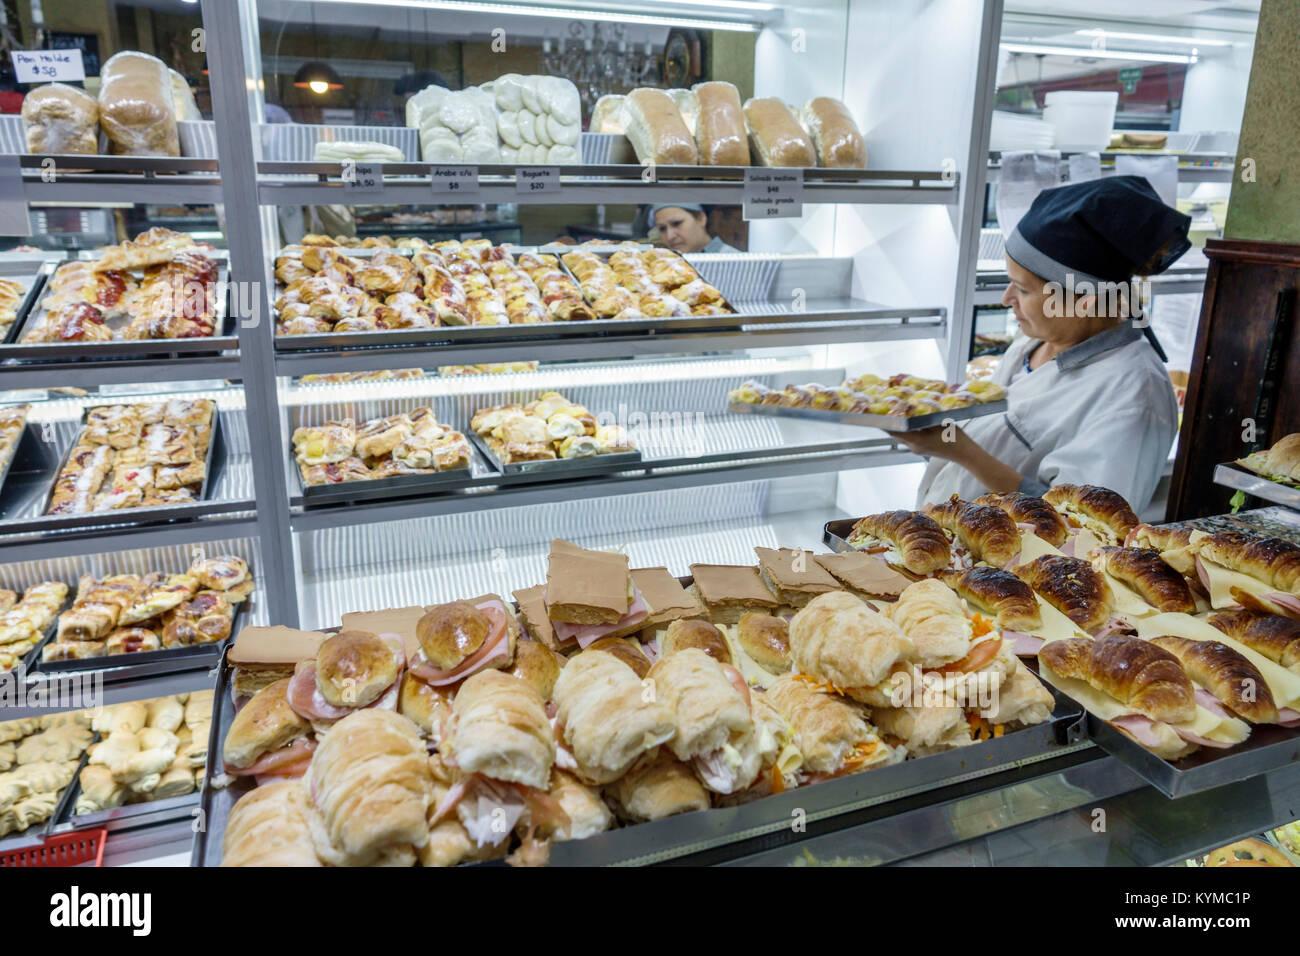 Buenos Aires Argentina Palermo Santa Elena pasteleria bakery interior Hispanic woman counter worker baked goods - Stock Image